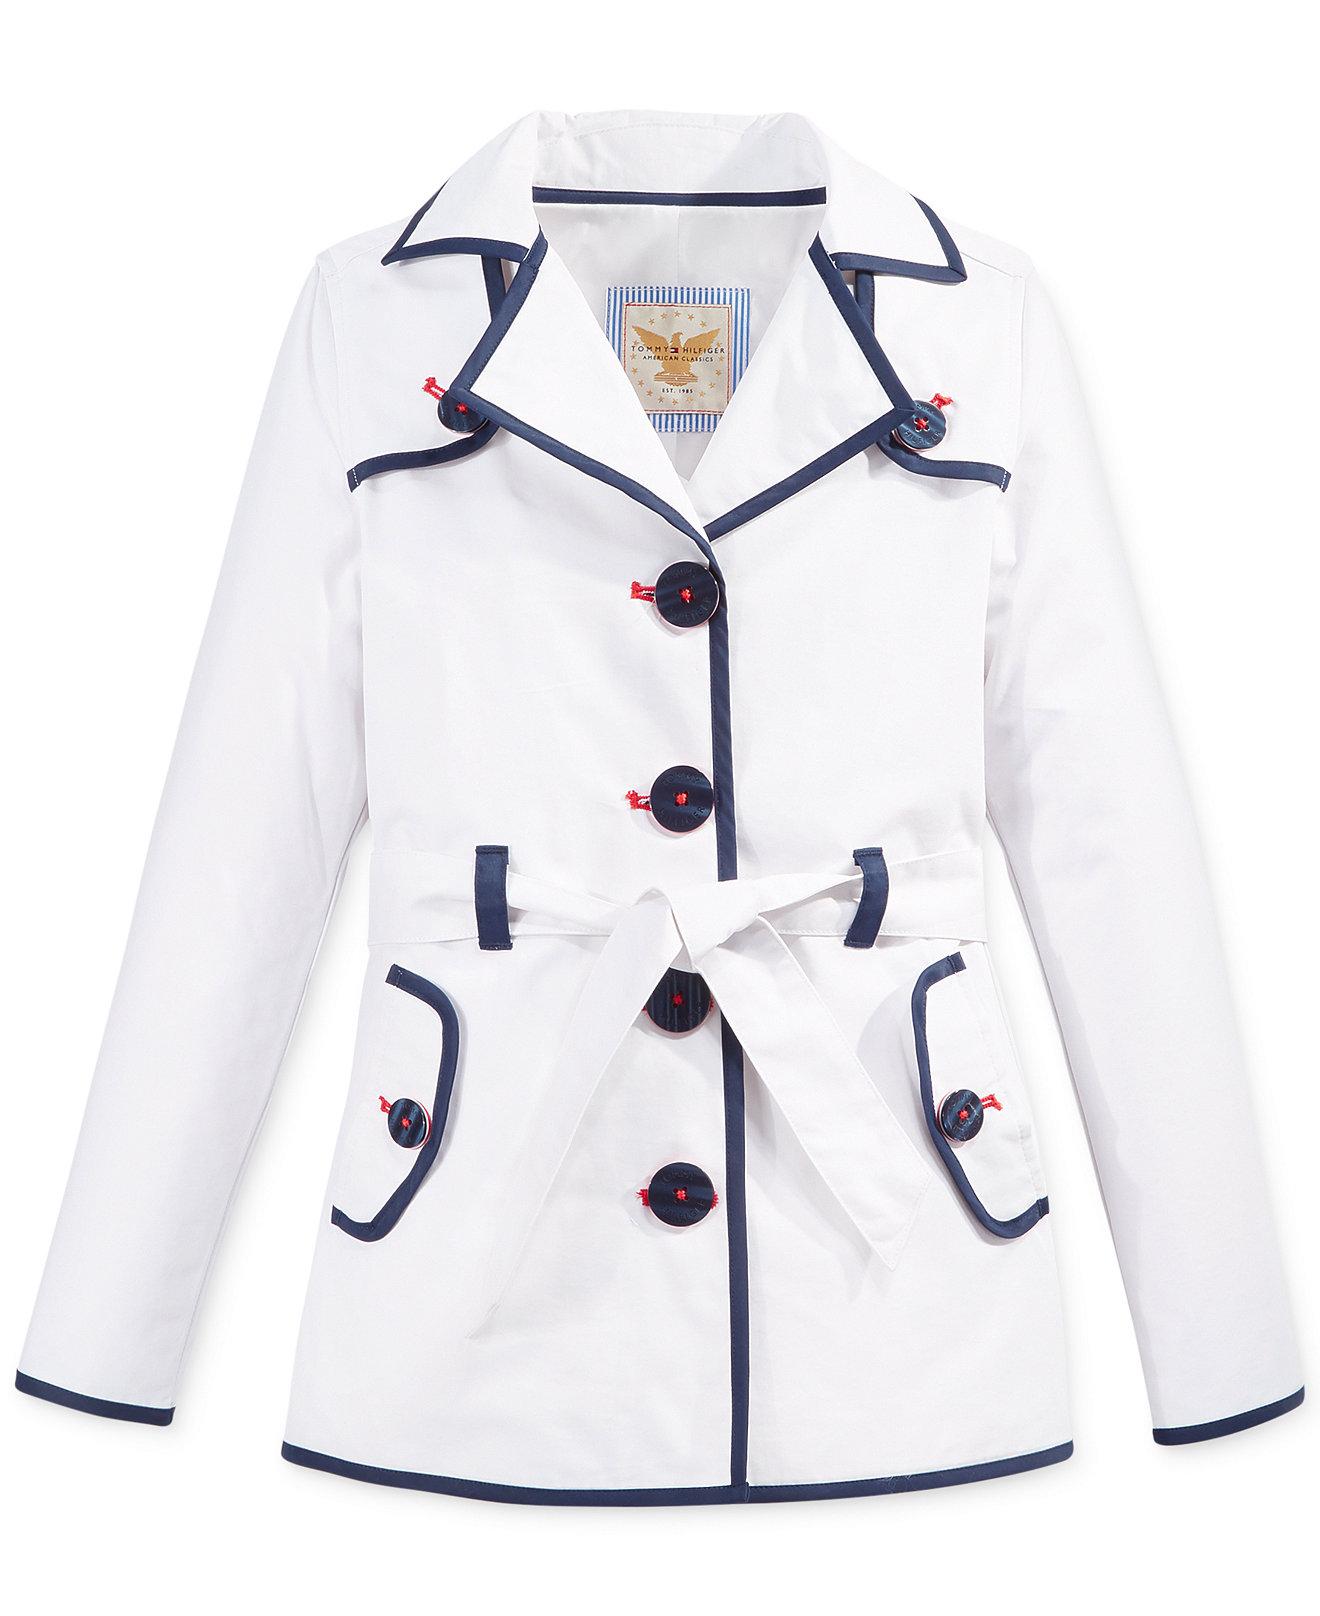 детское пальто OTHER 2015 Tommy Hilfiger детское пальто other 2015 0 4